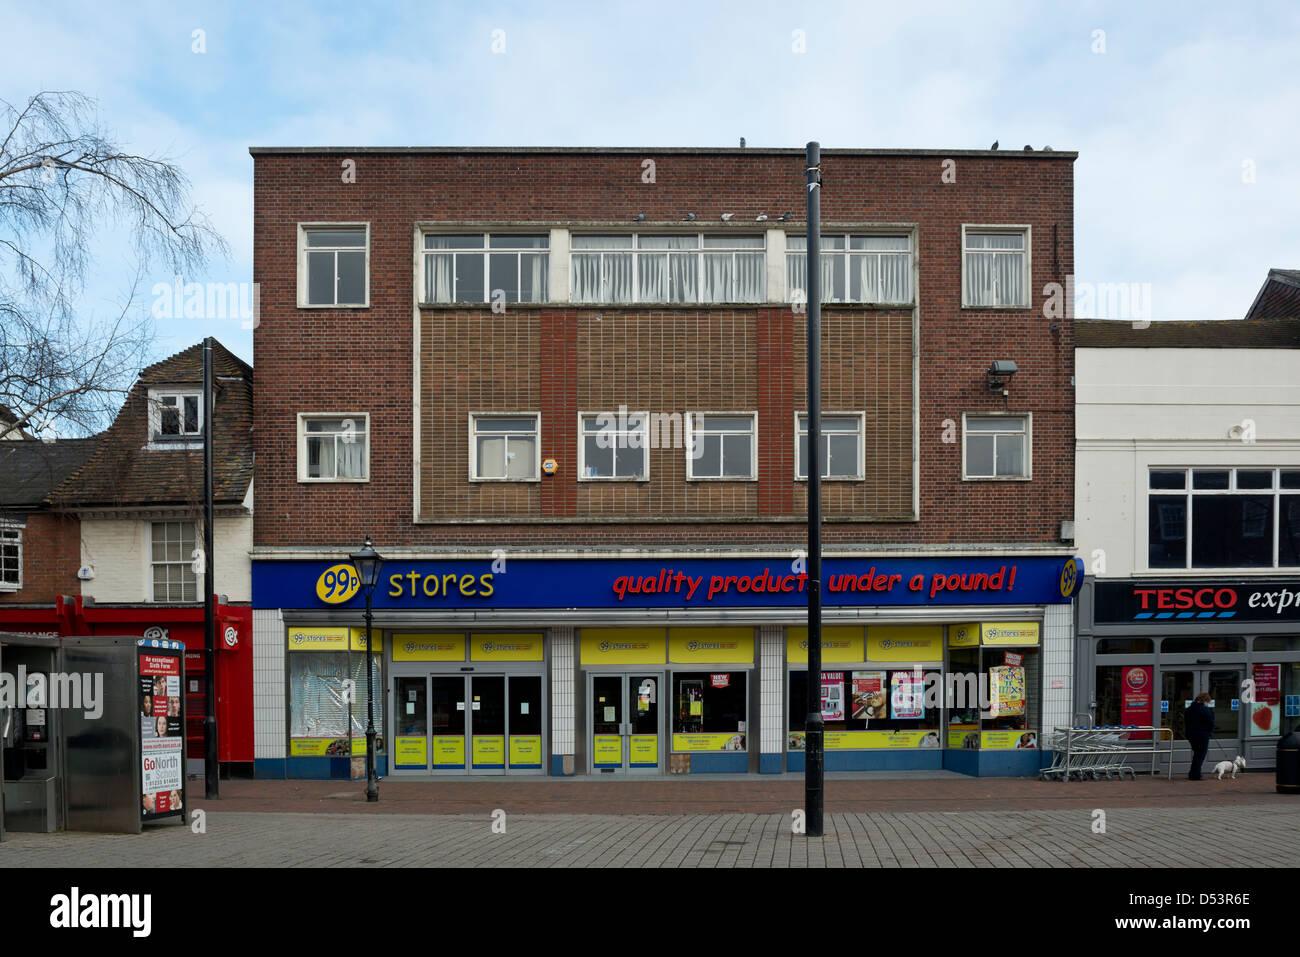 A 99p discount store, High Street, Ashford, Kent - Stock Image